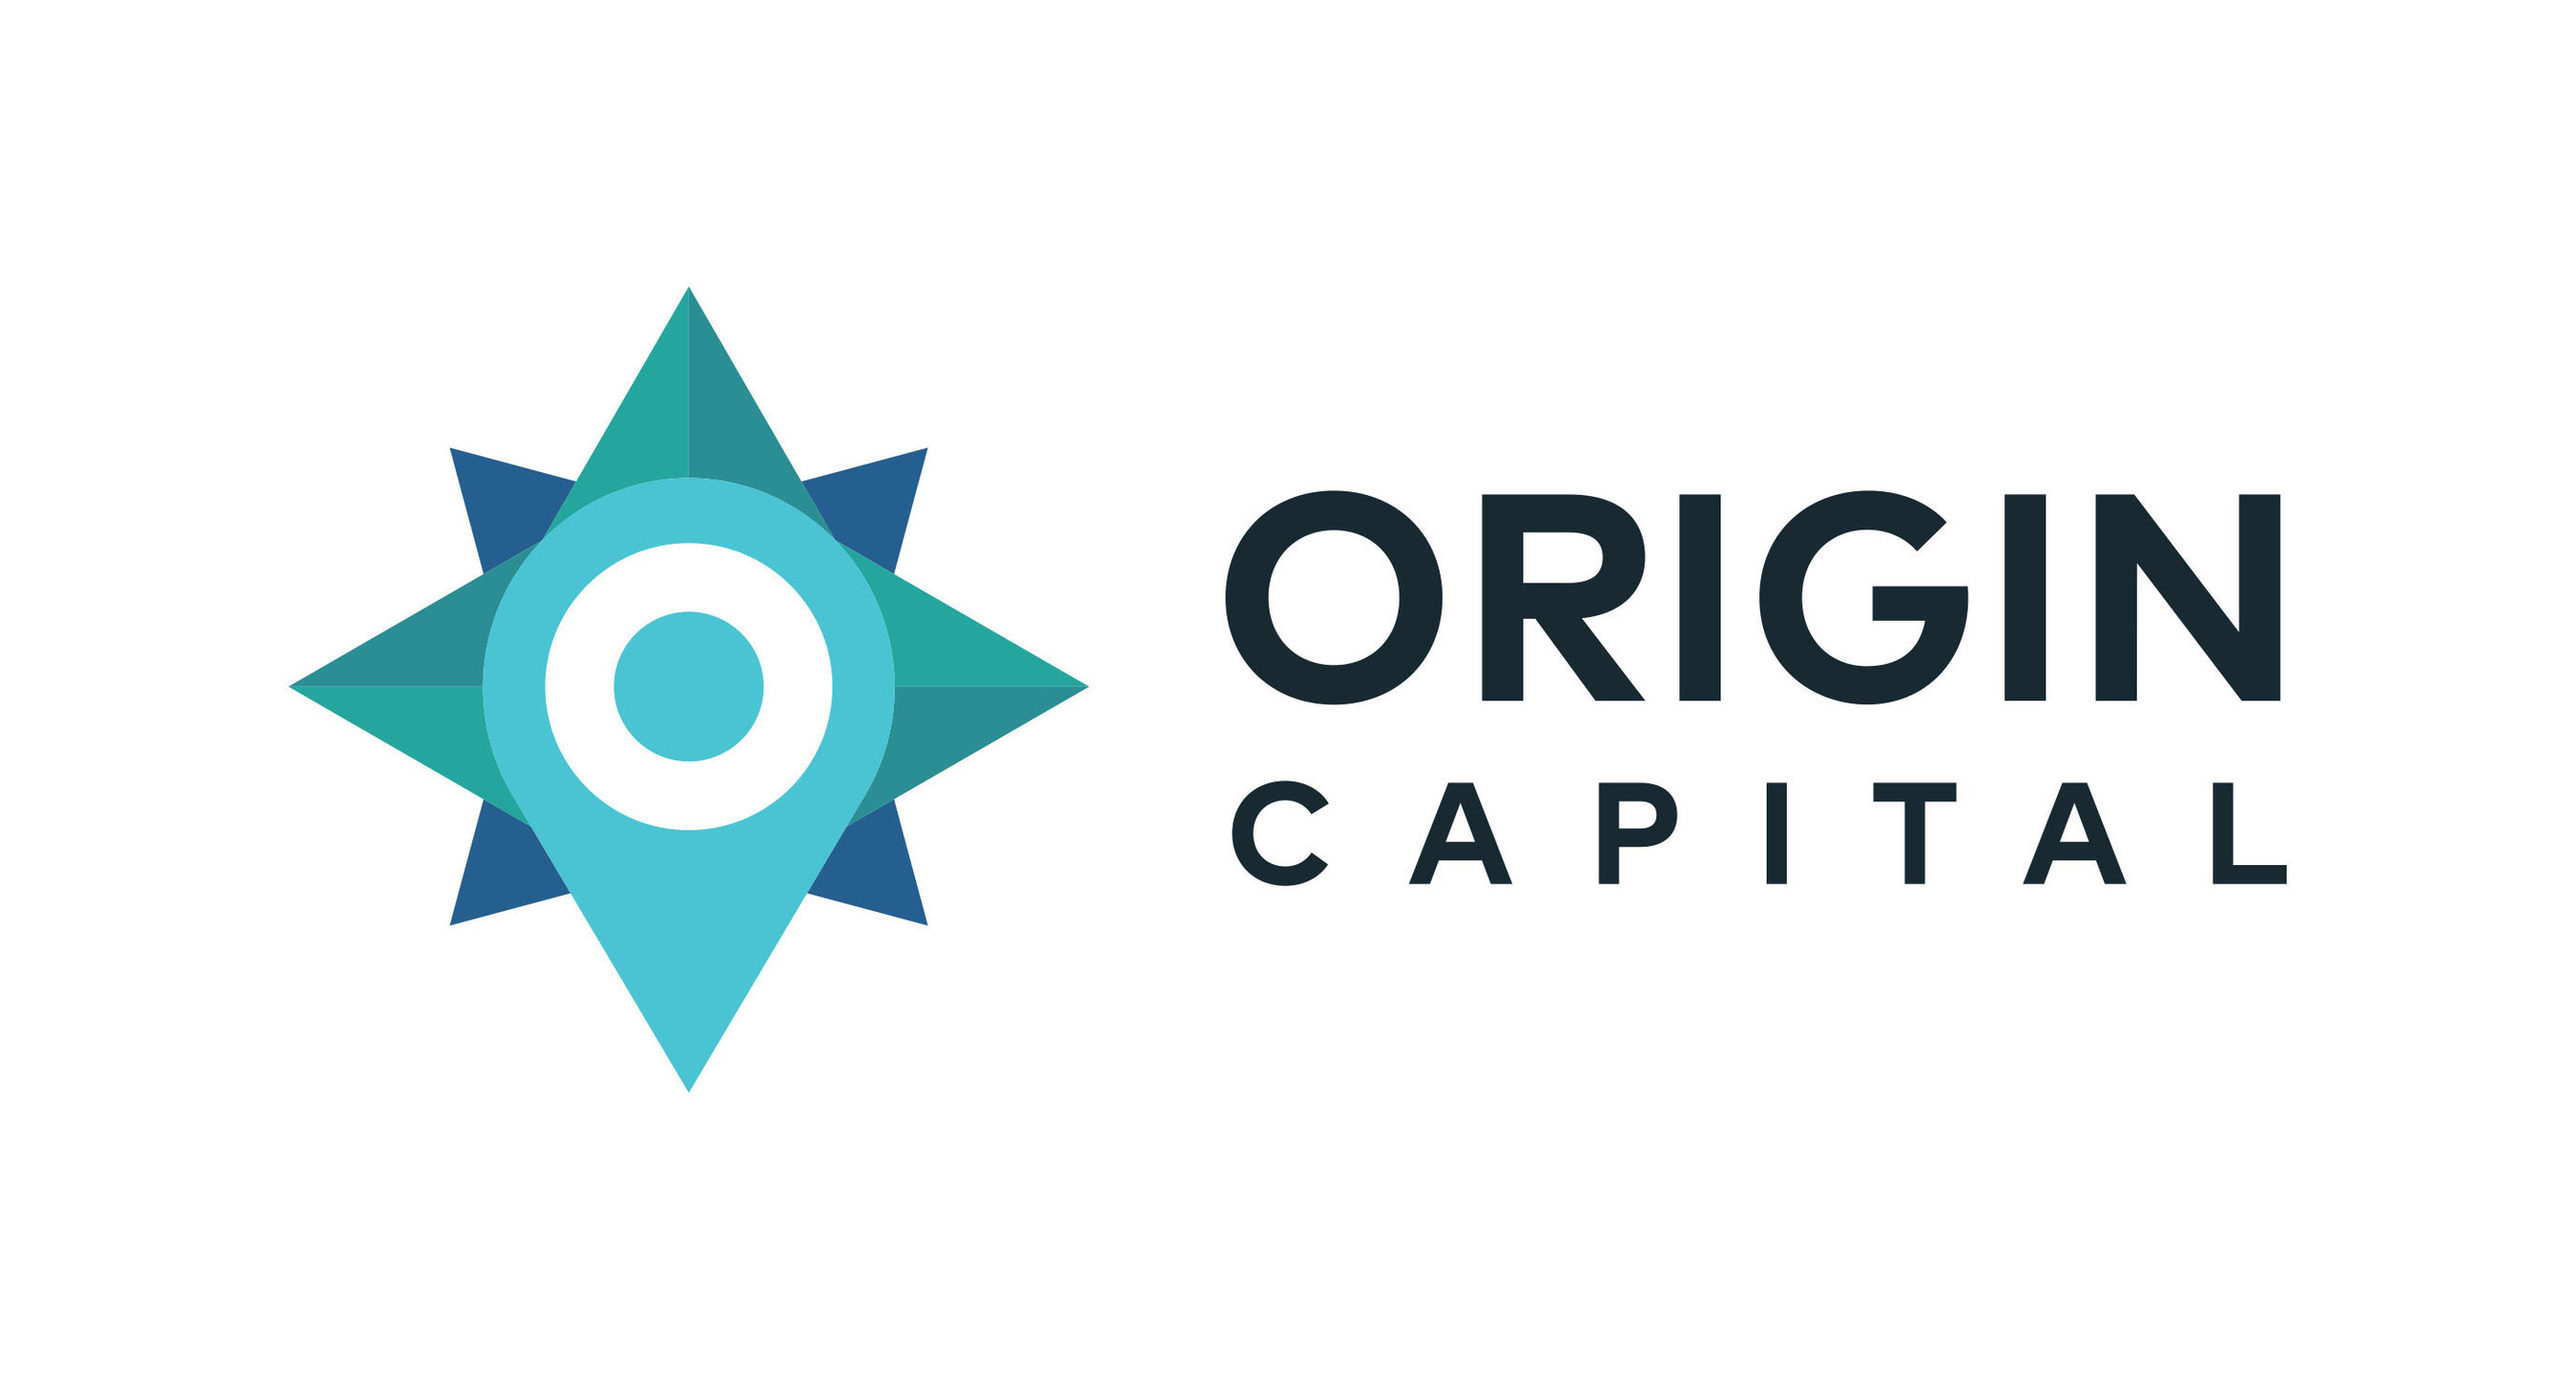 origin capital unveils commercial real estate platform allows for